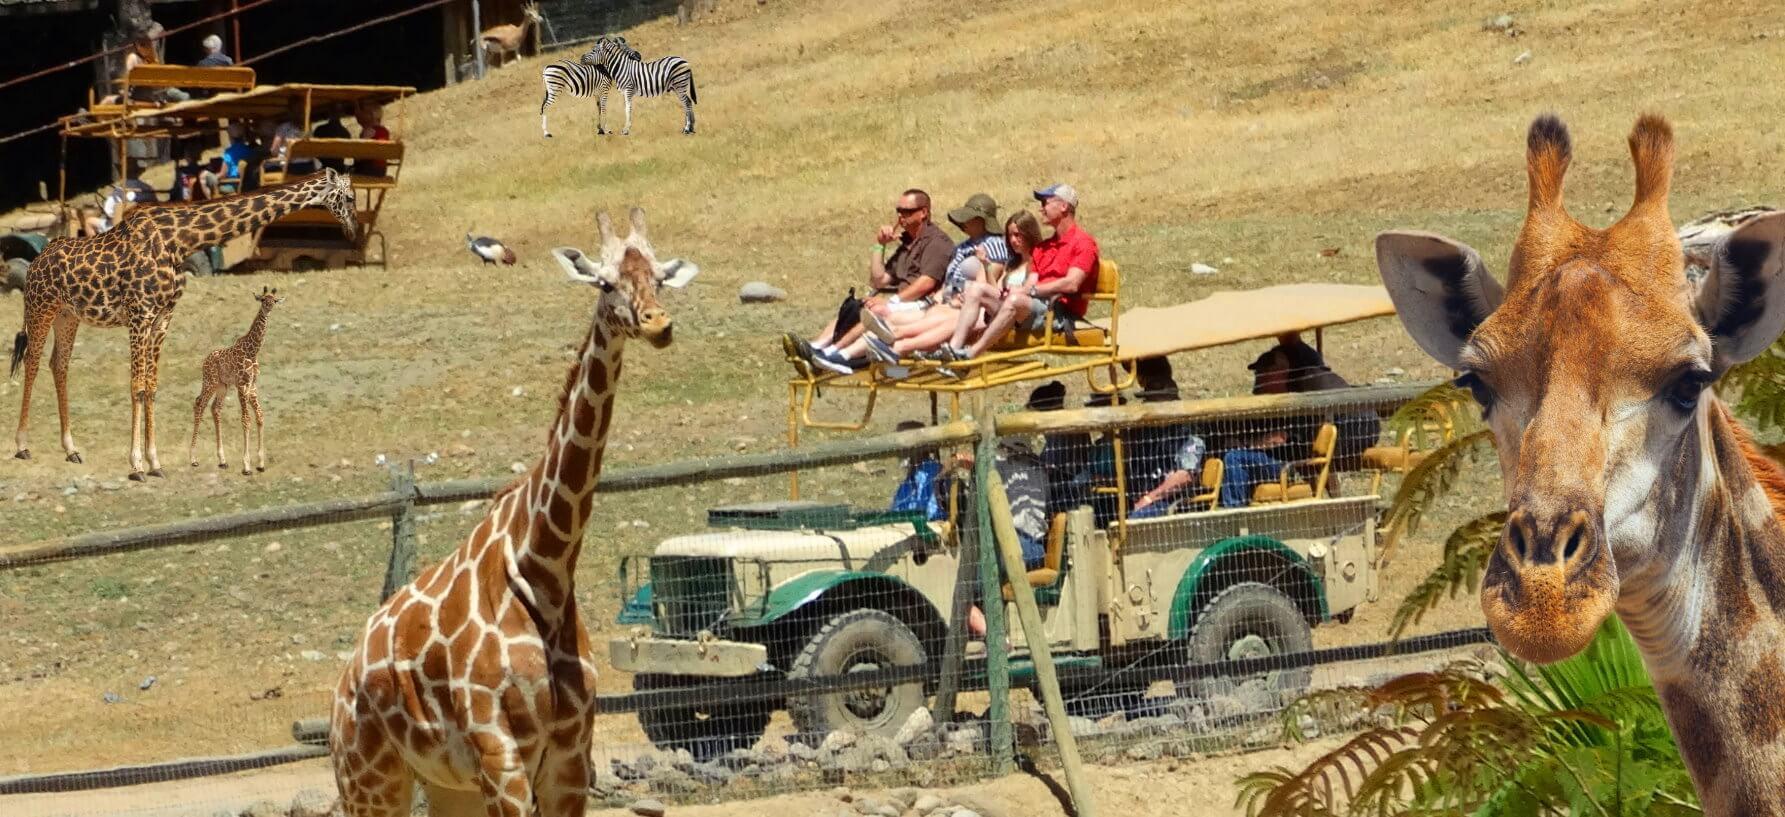 the_best_safari_west_jeep_tour_+_alcatraz_tickets